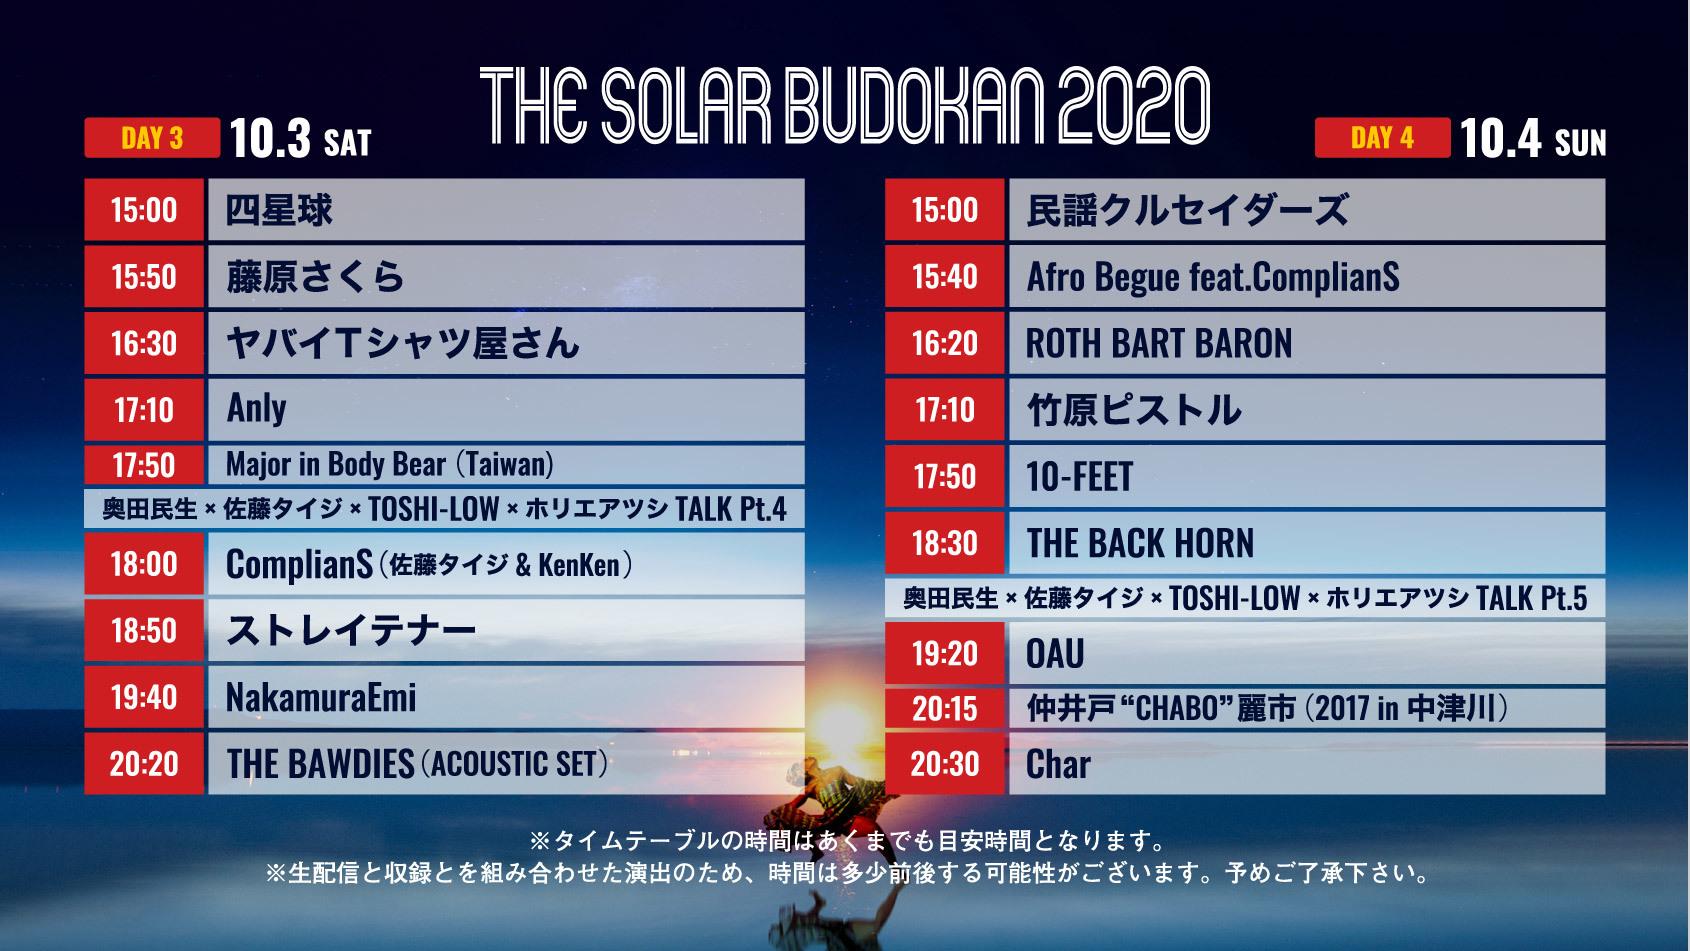 『THE SOLAR BUDOKAN 2020』 2週目タイムテーブル